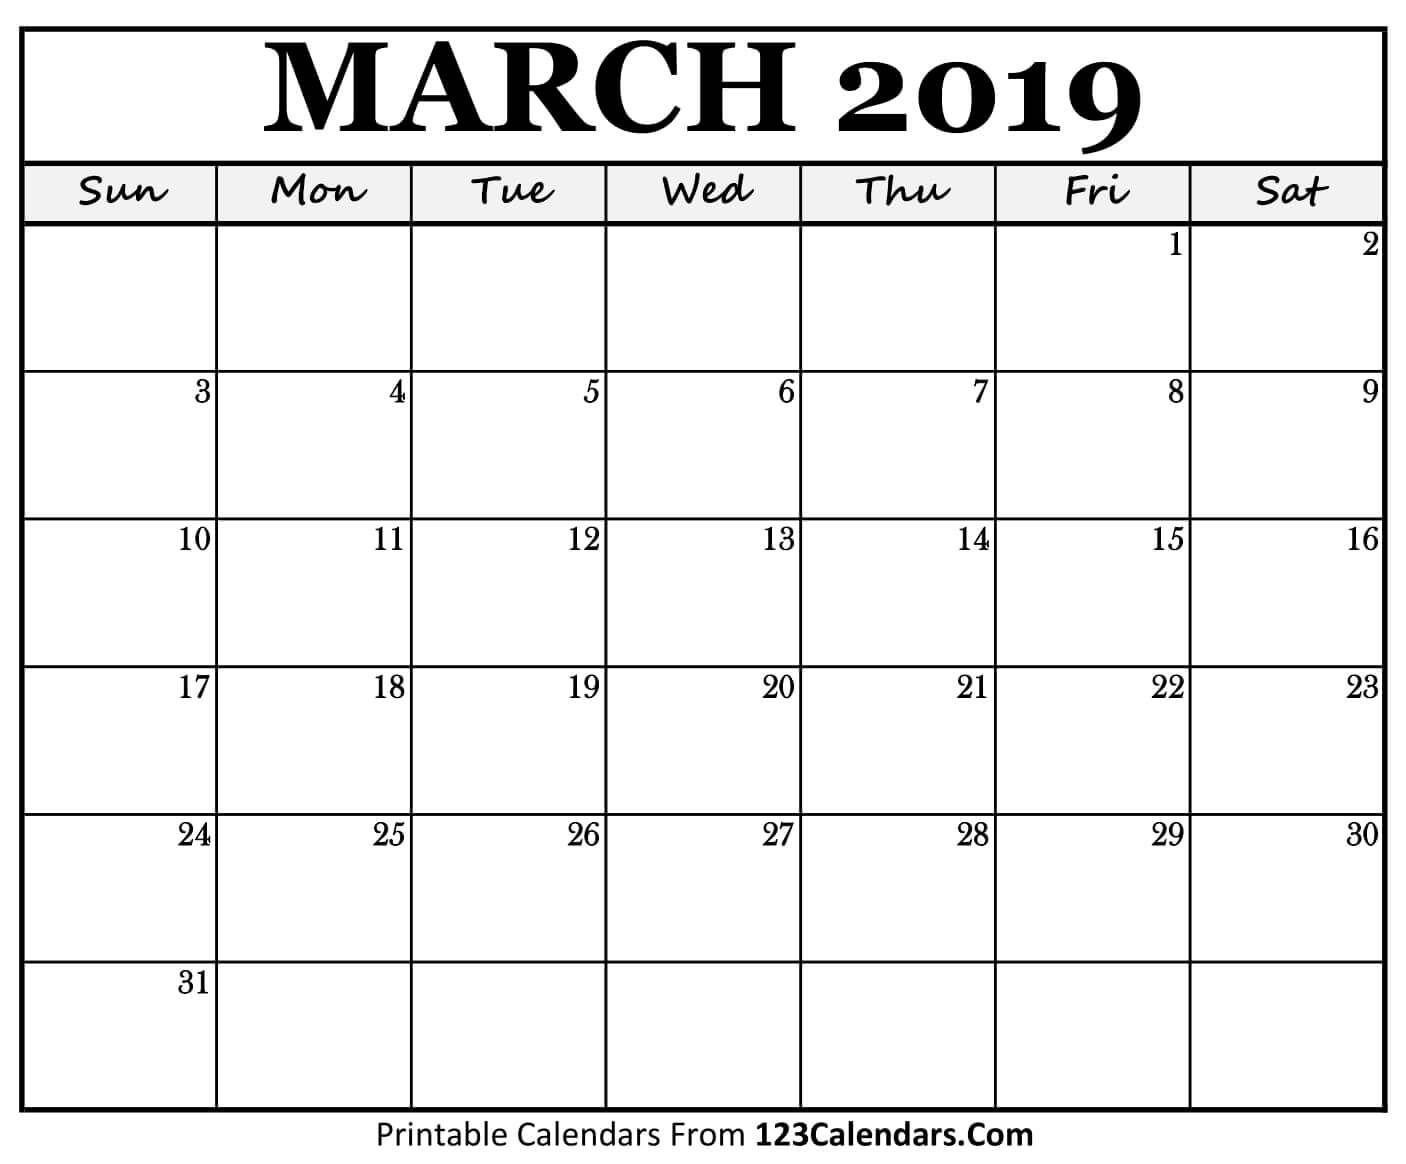 Printable March Month Calendar 2019 | Calendar Printables intended for 4 Month Printable Calendar